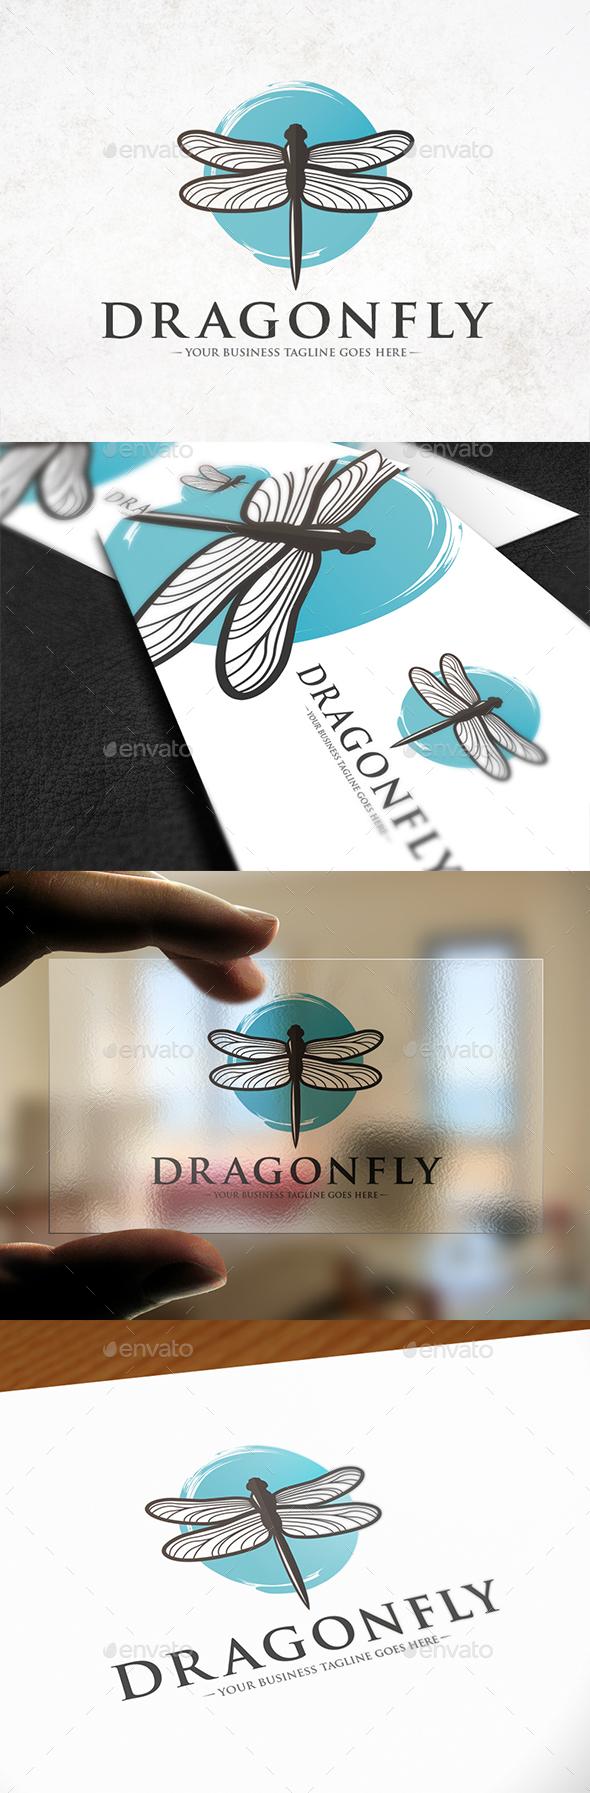 Sky Dragonfly Logo Template - Animals Logo Templates